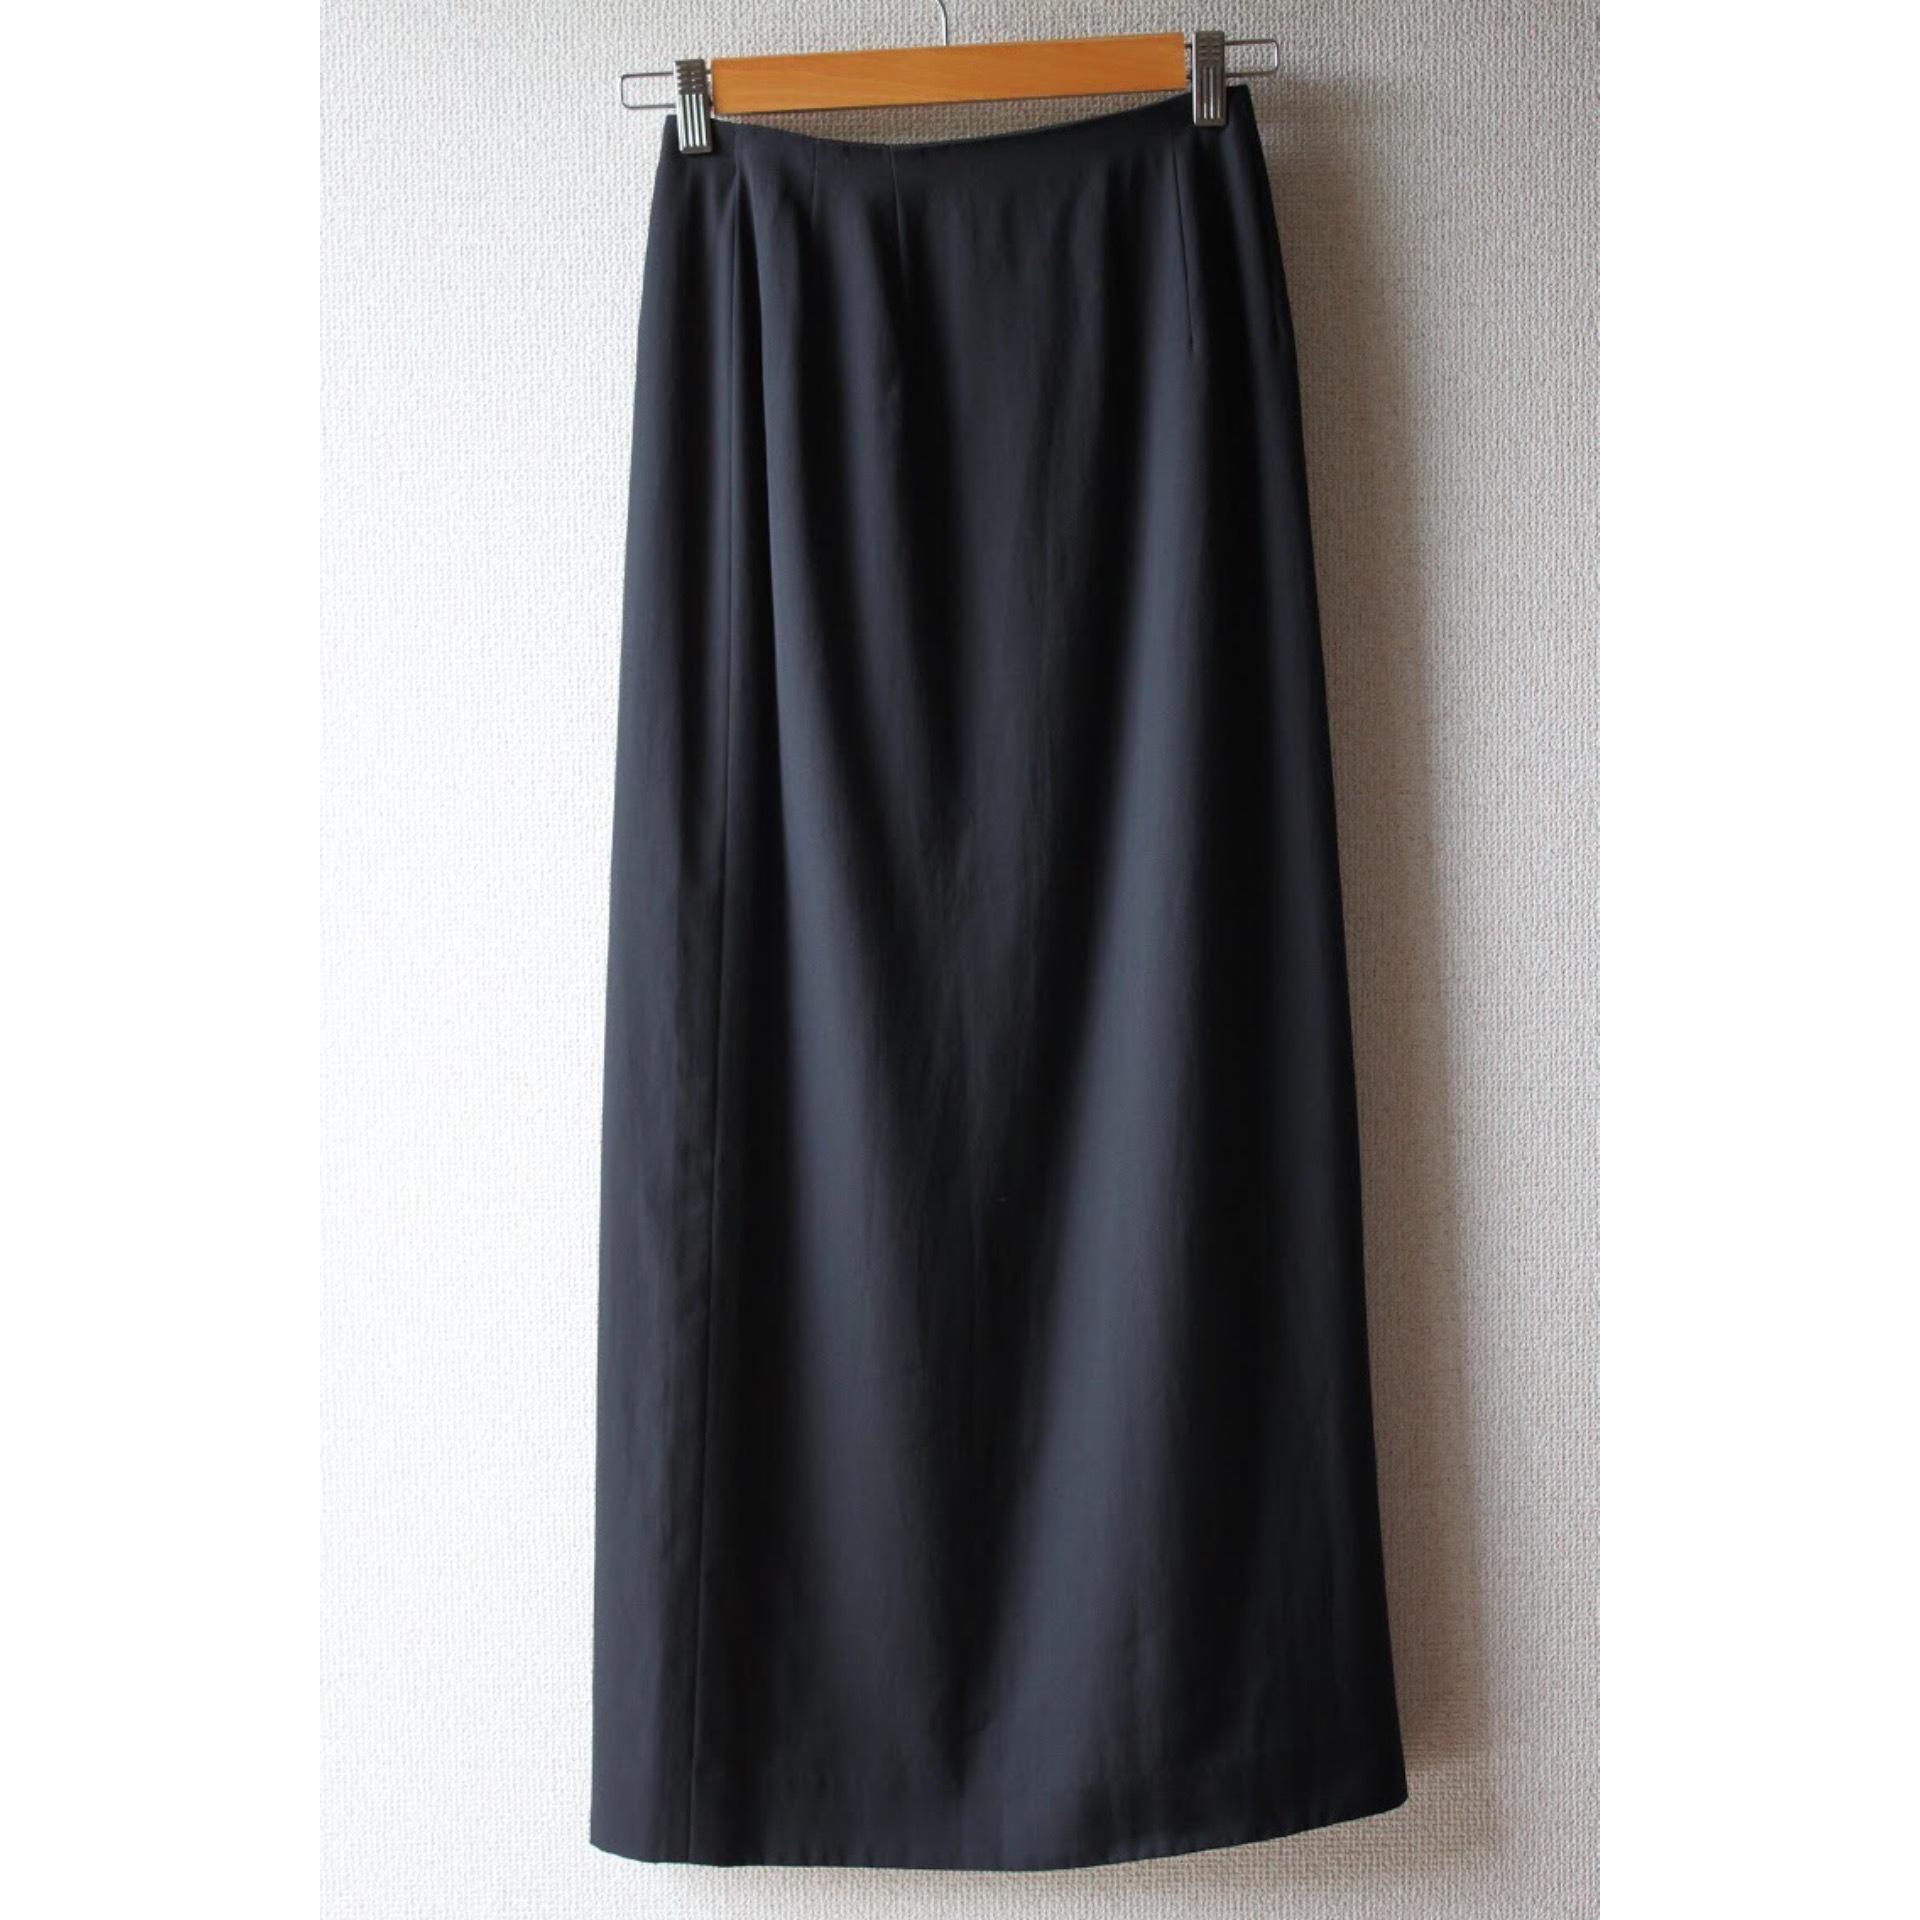 Long black skirt by LANVIN